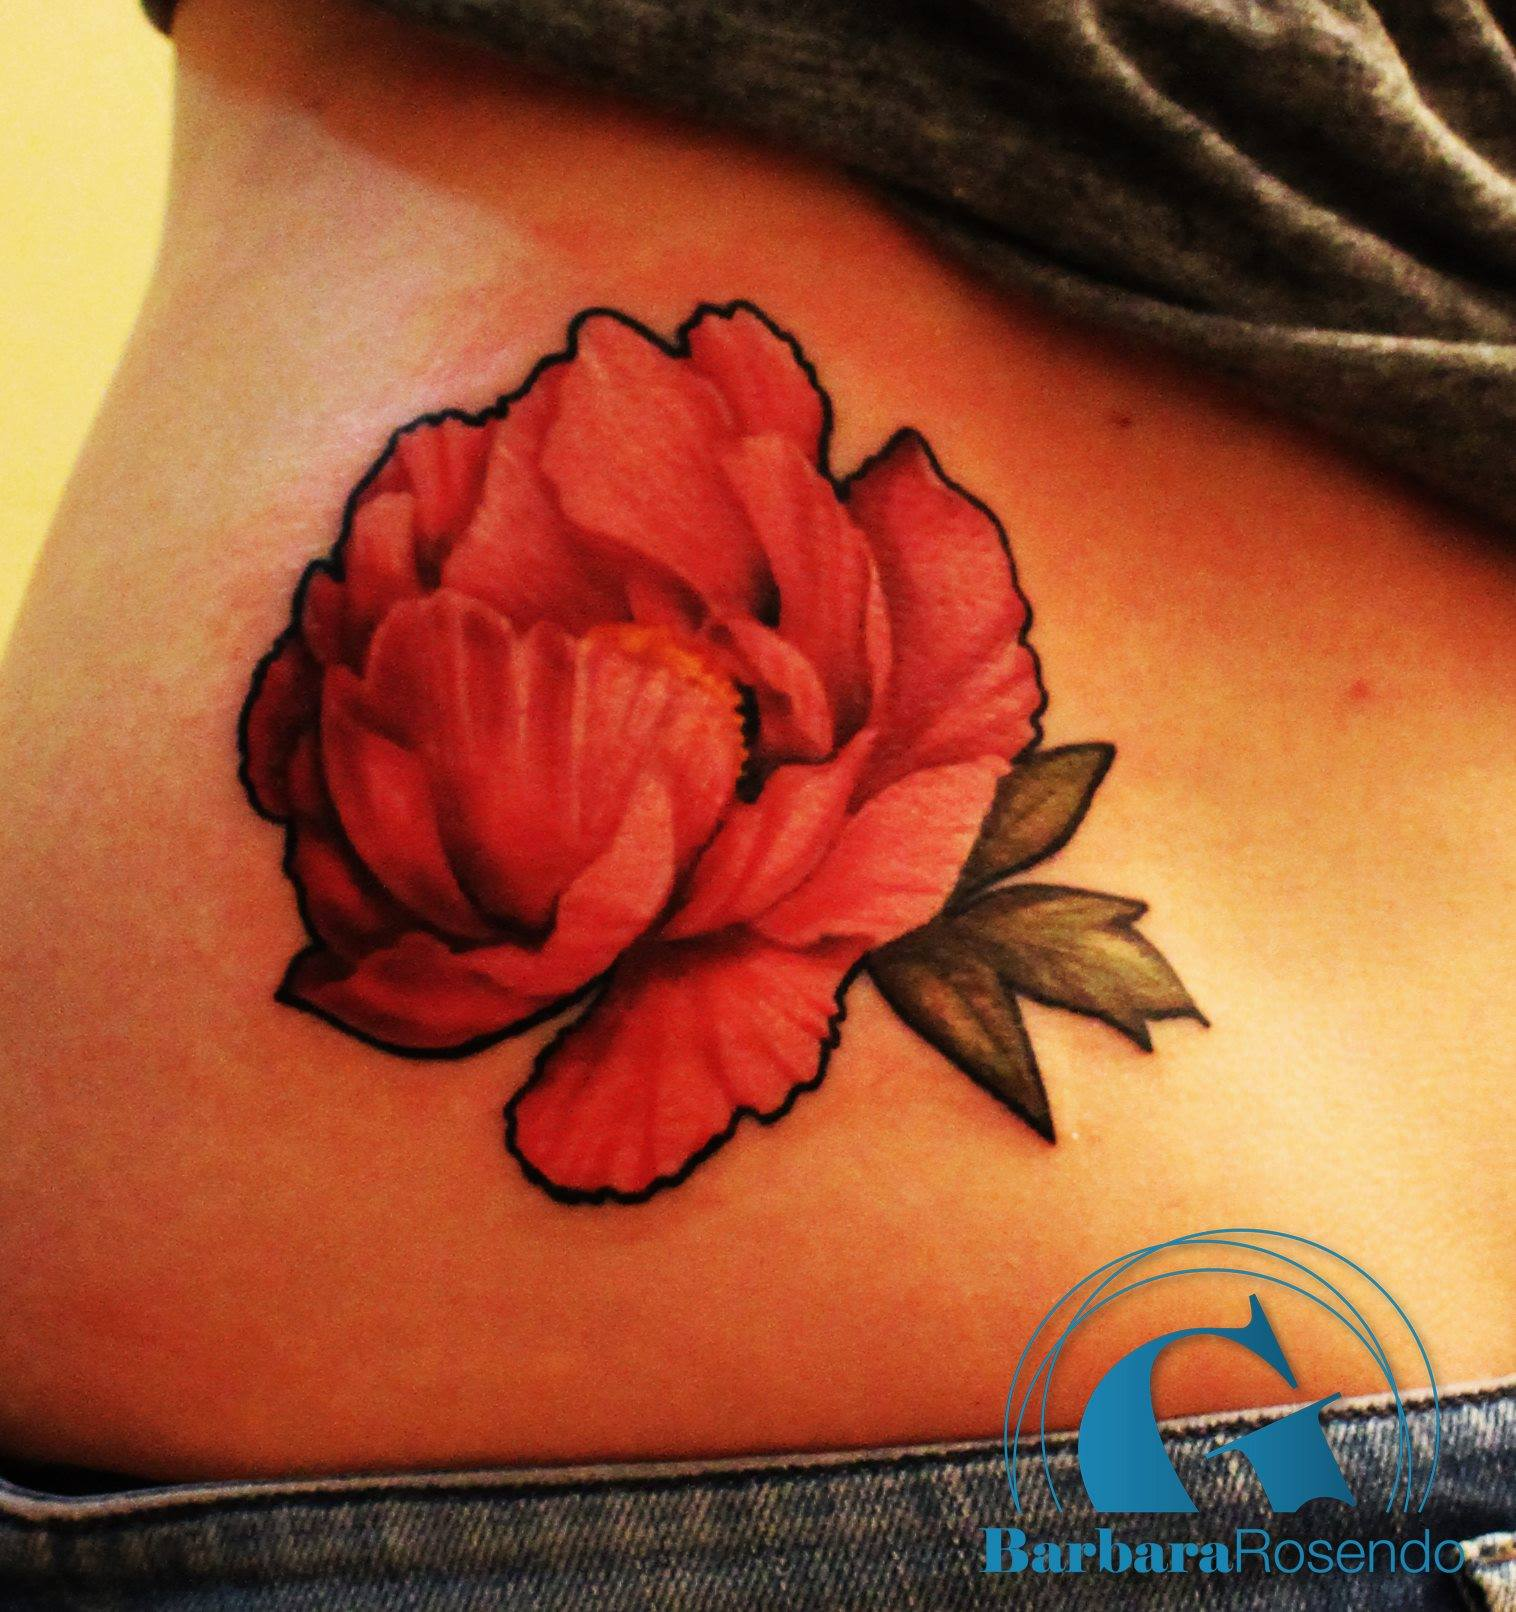 Modele Tatouage Fleur Pivoine Couleur Jpg Graphicaderme